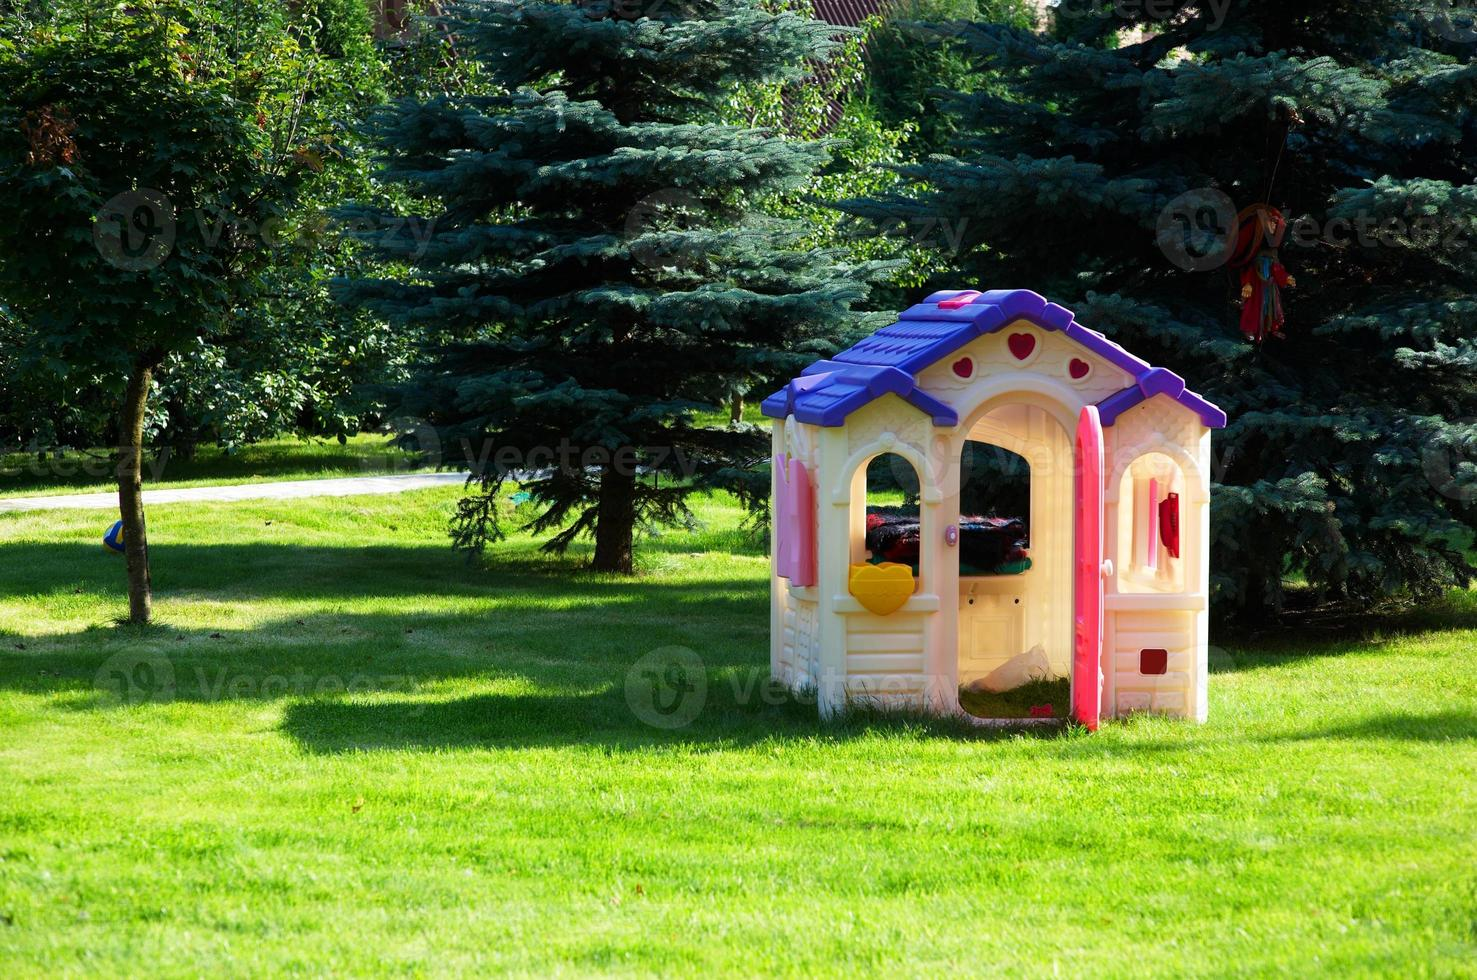 Children's Play House photo